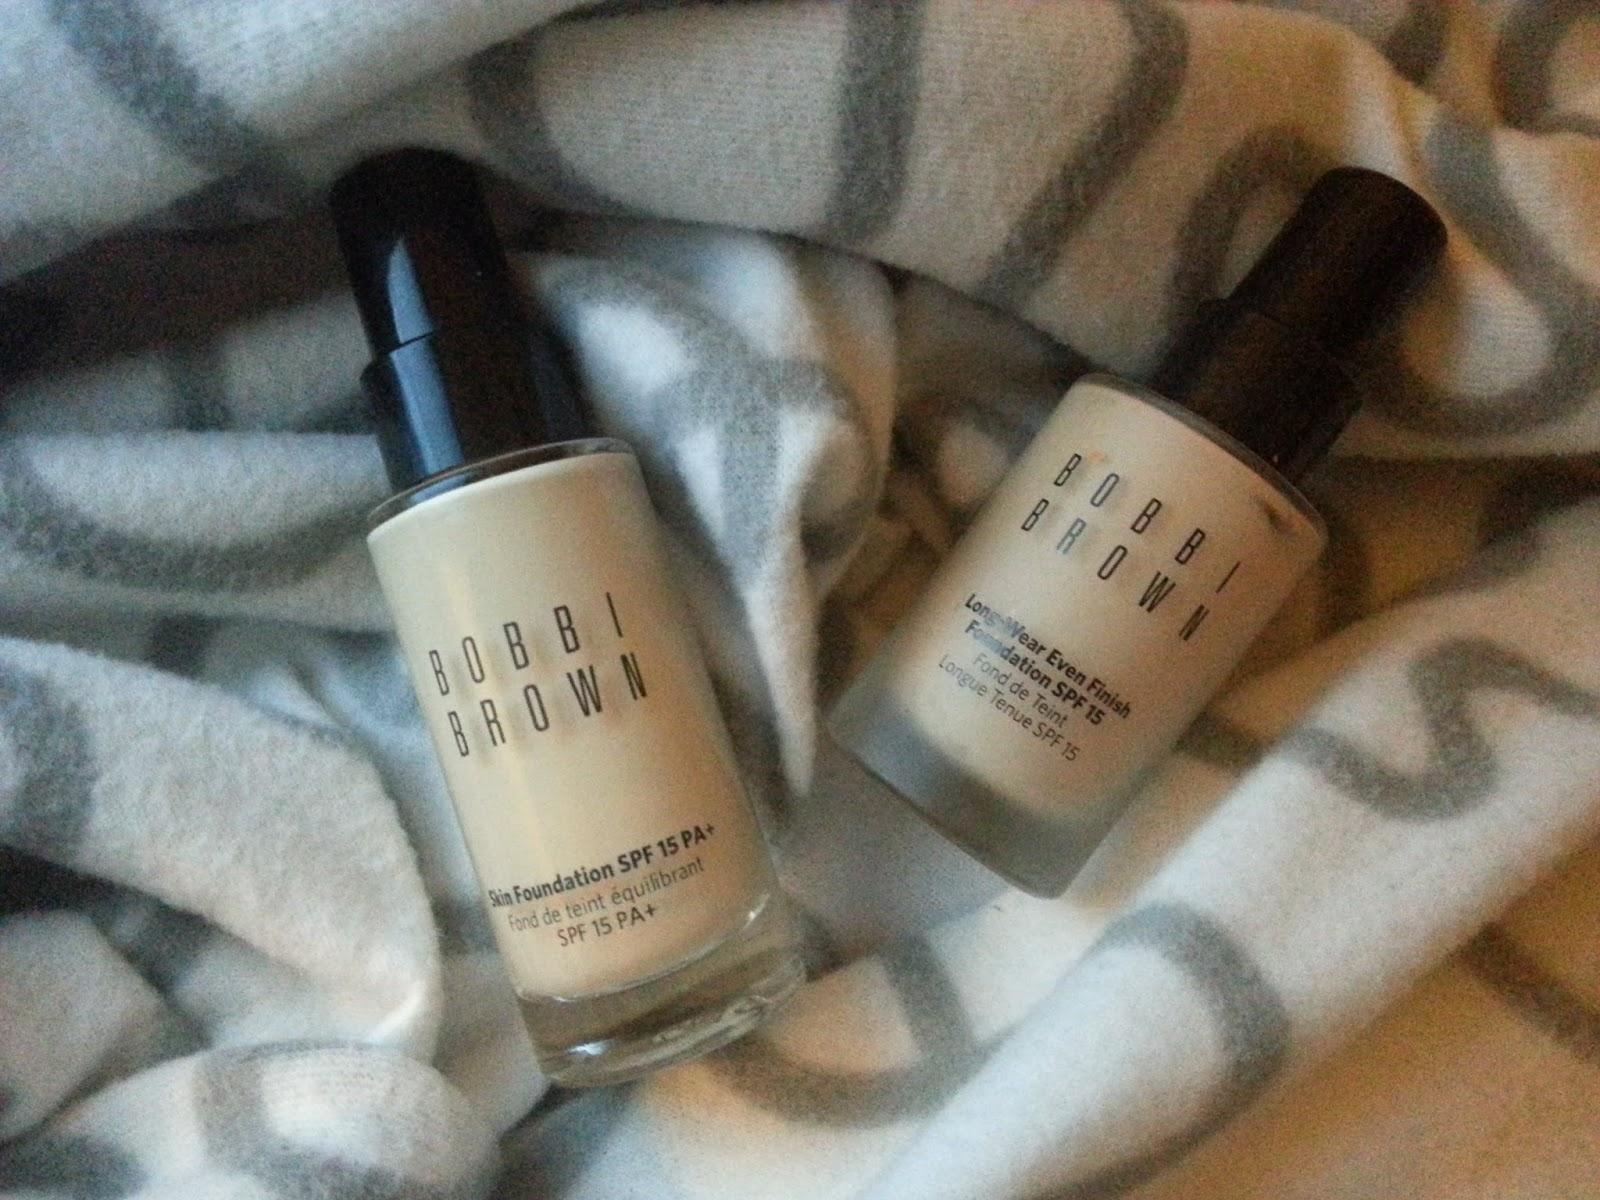 Bobbi Brown Skin Foundation VS Long-Wear Even Finish Foundation